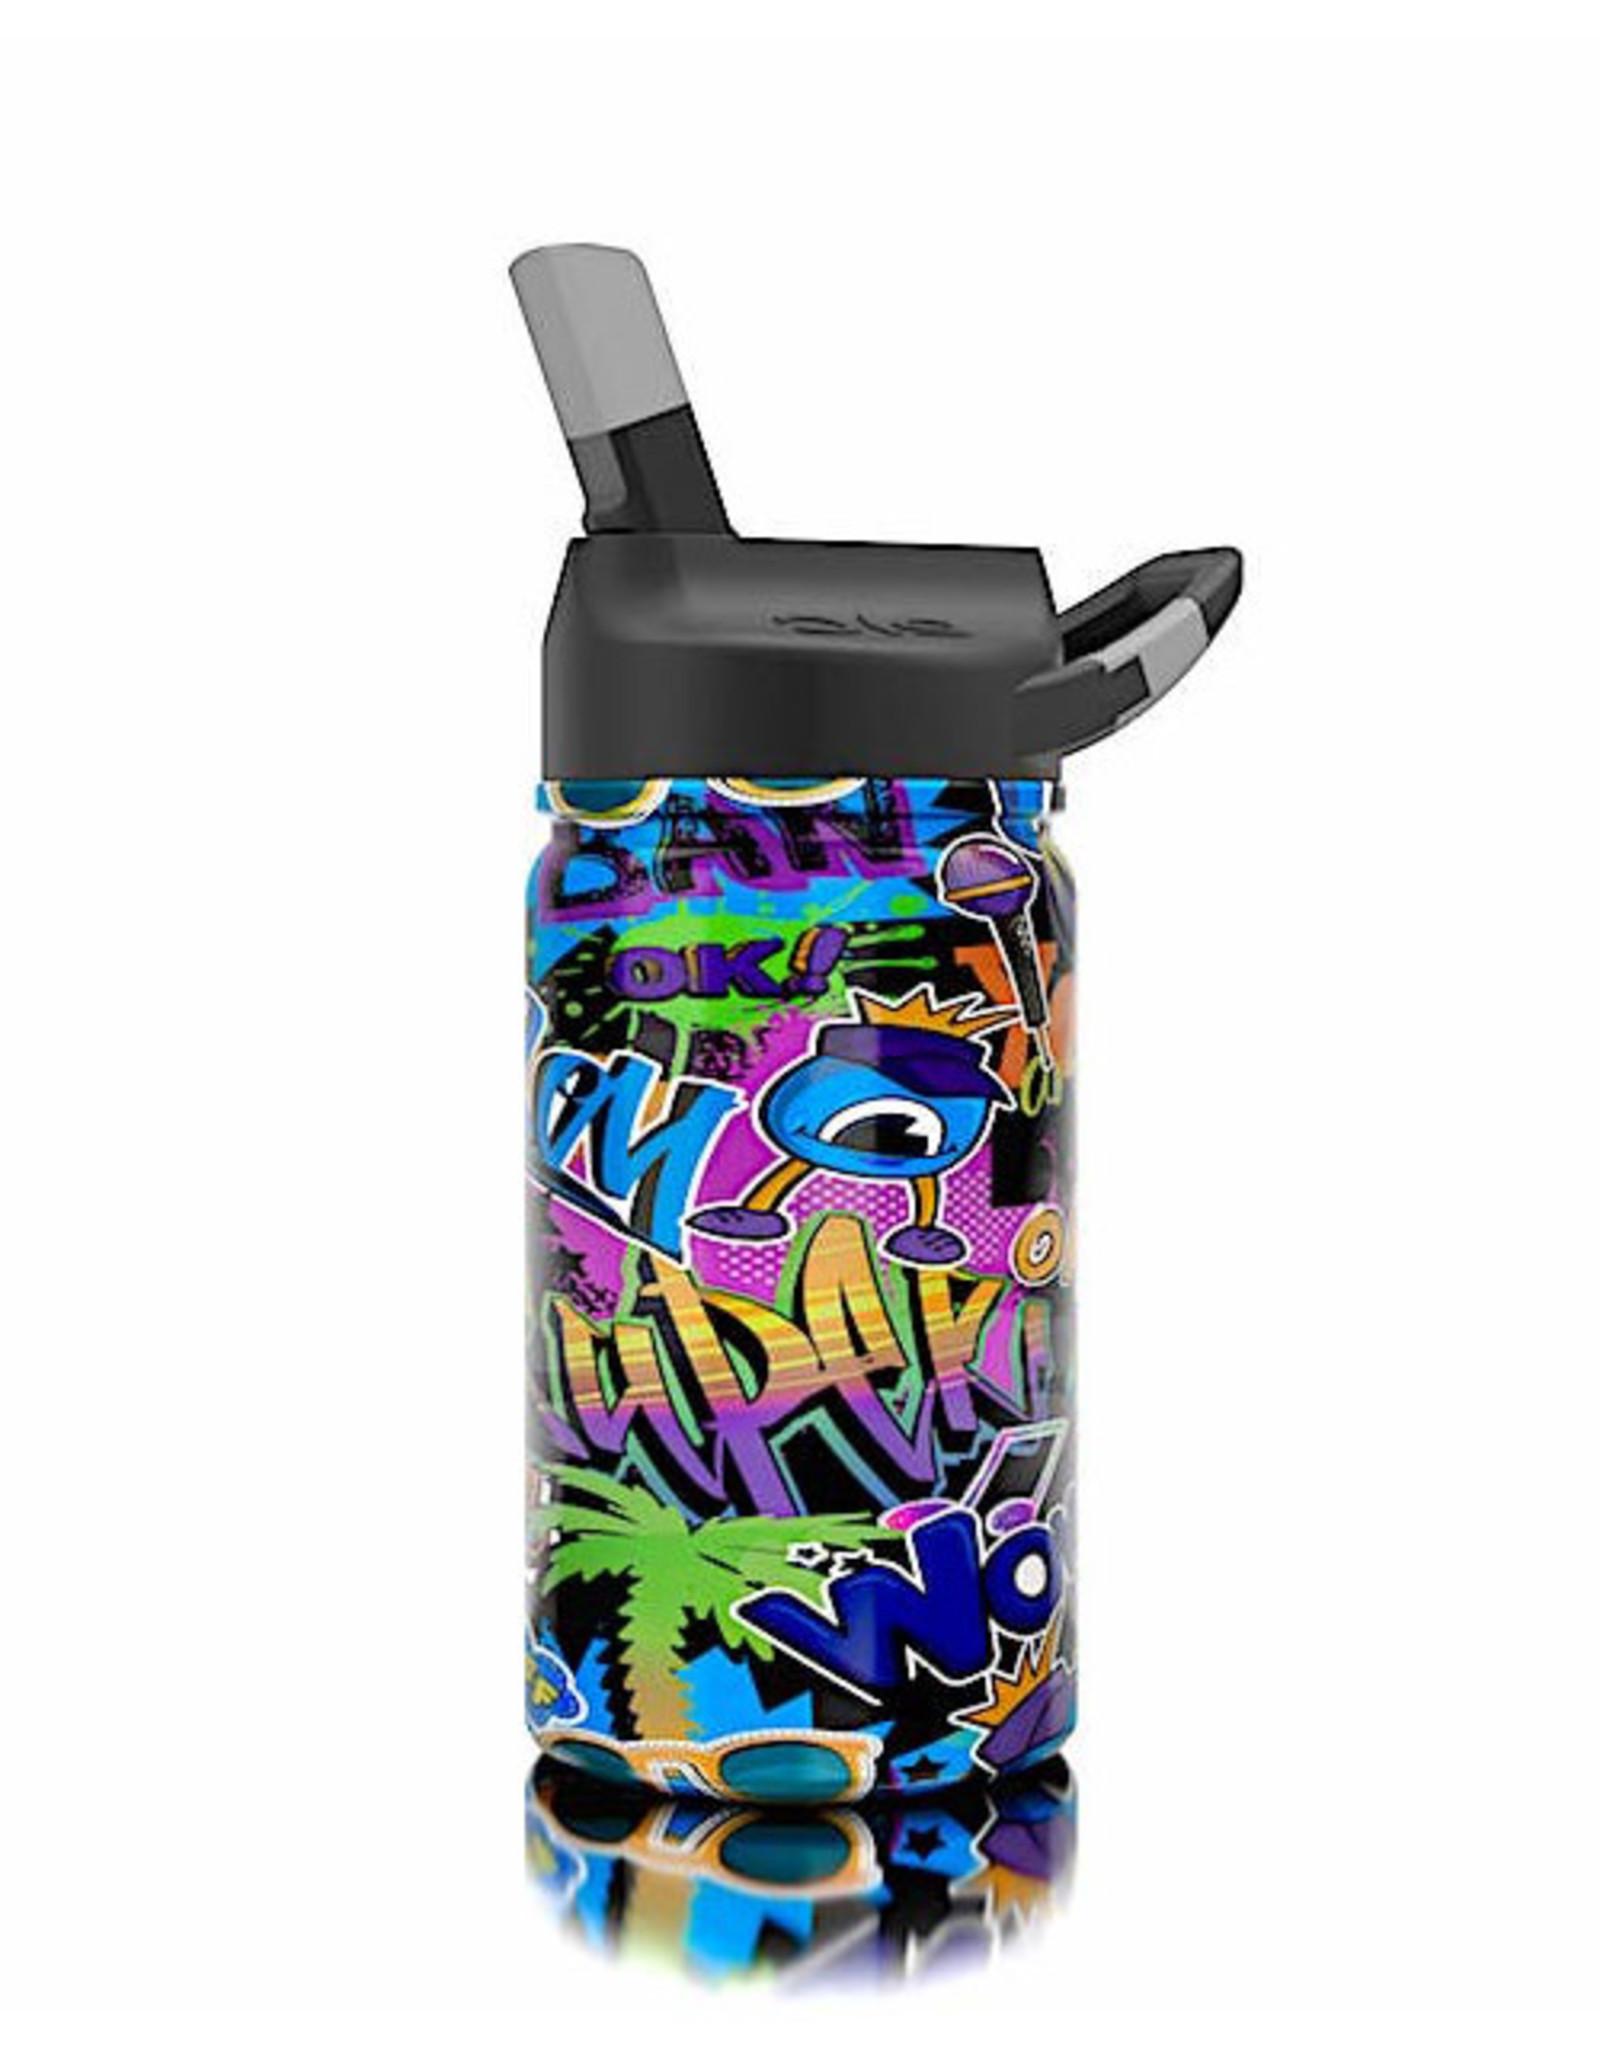 12 oz lil SIC bottle -